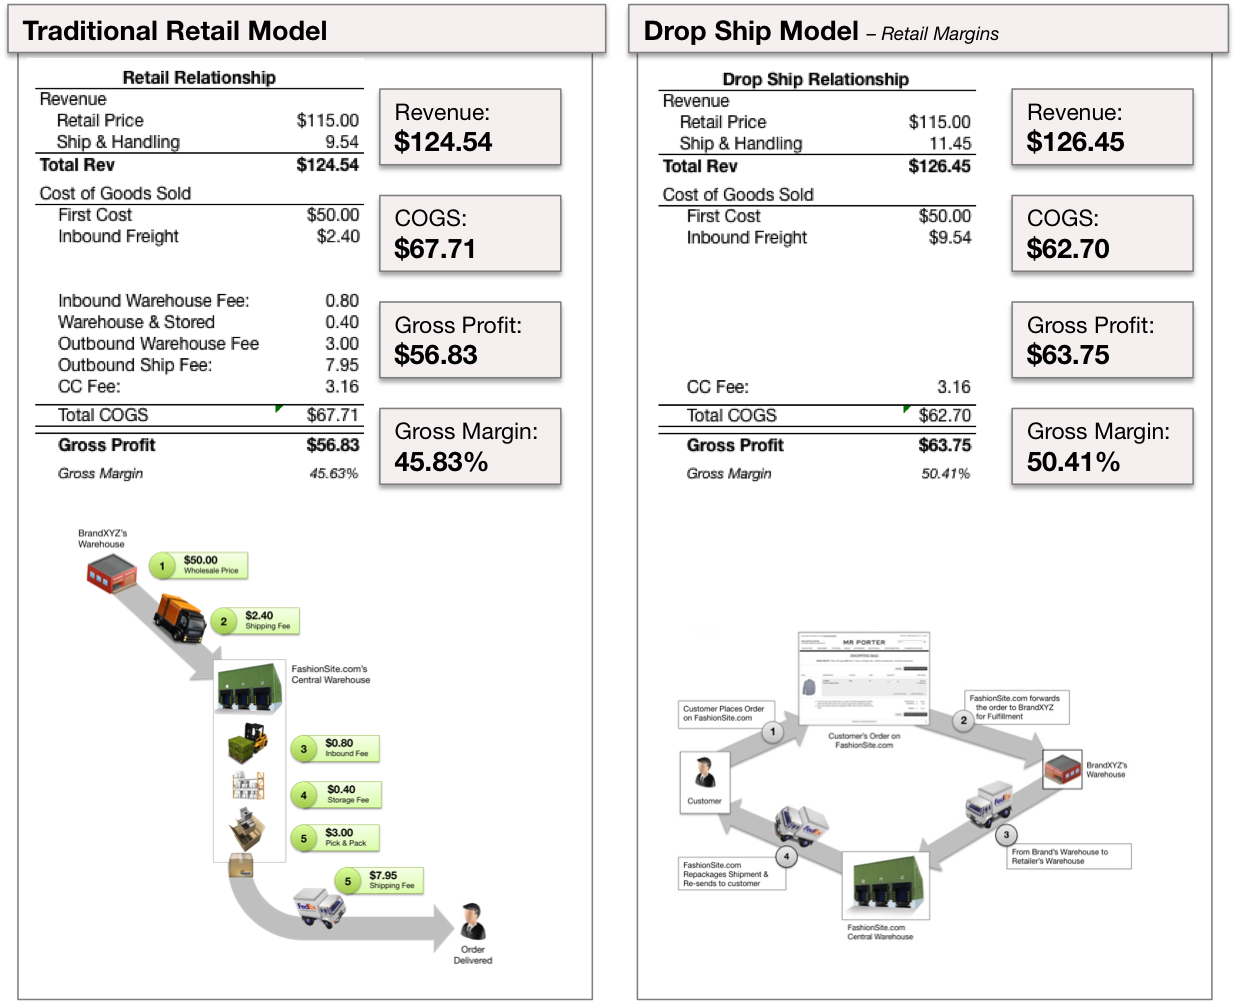 dropship vs retail transpo costs.png